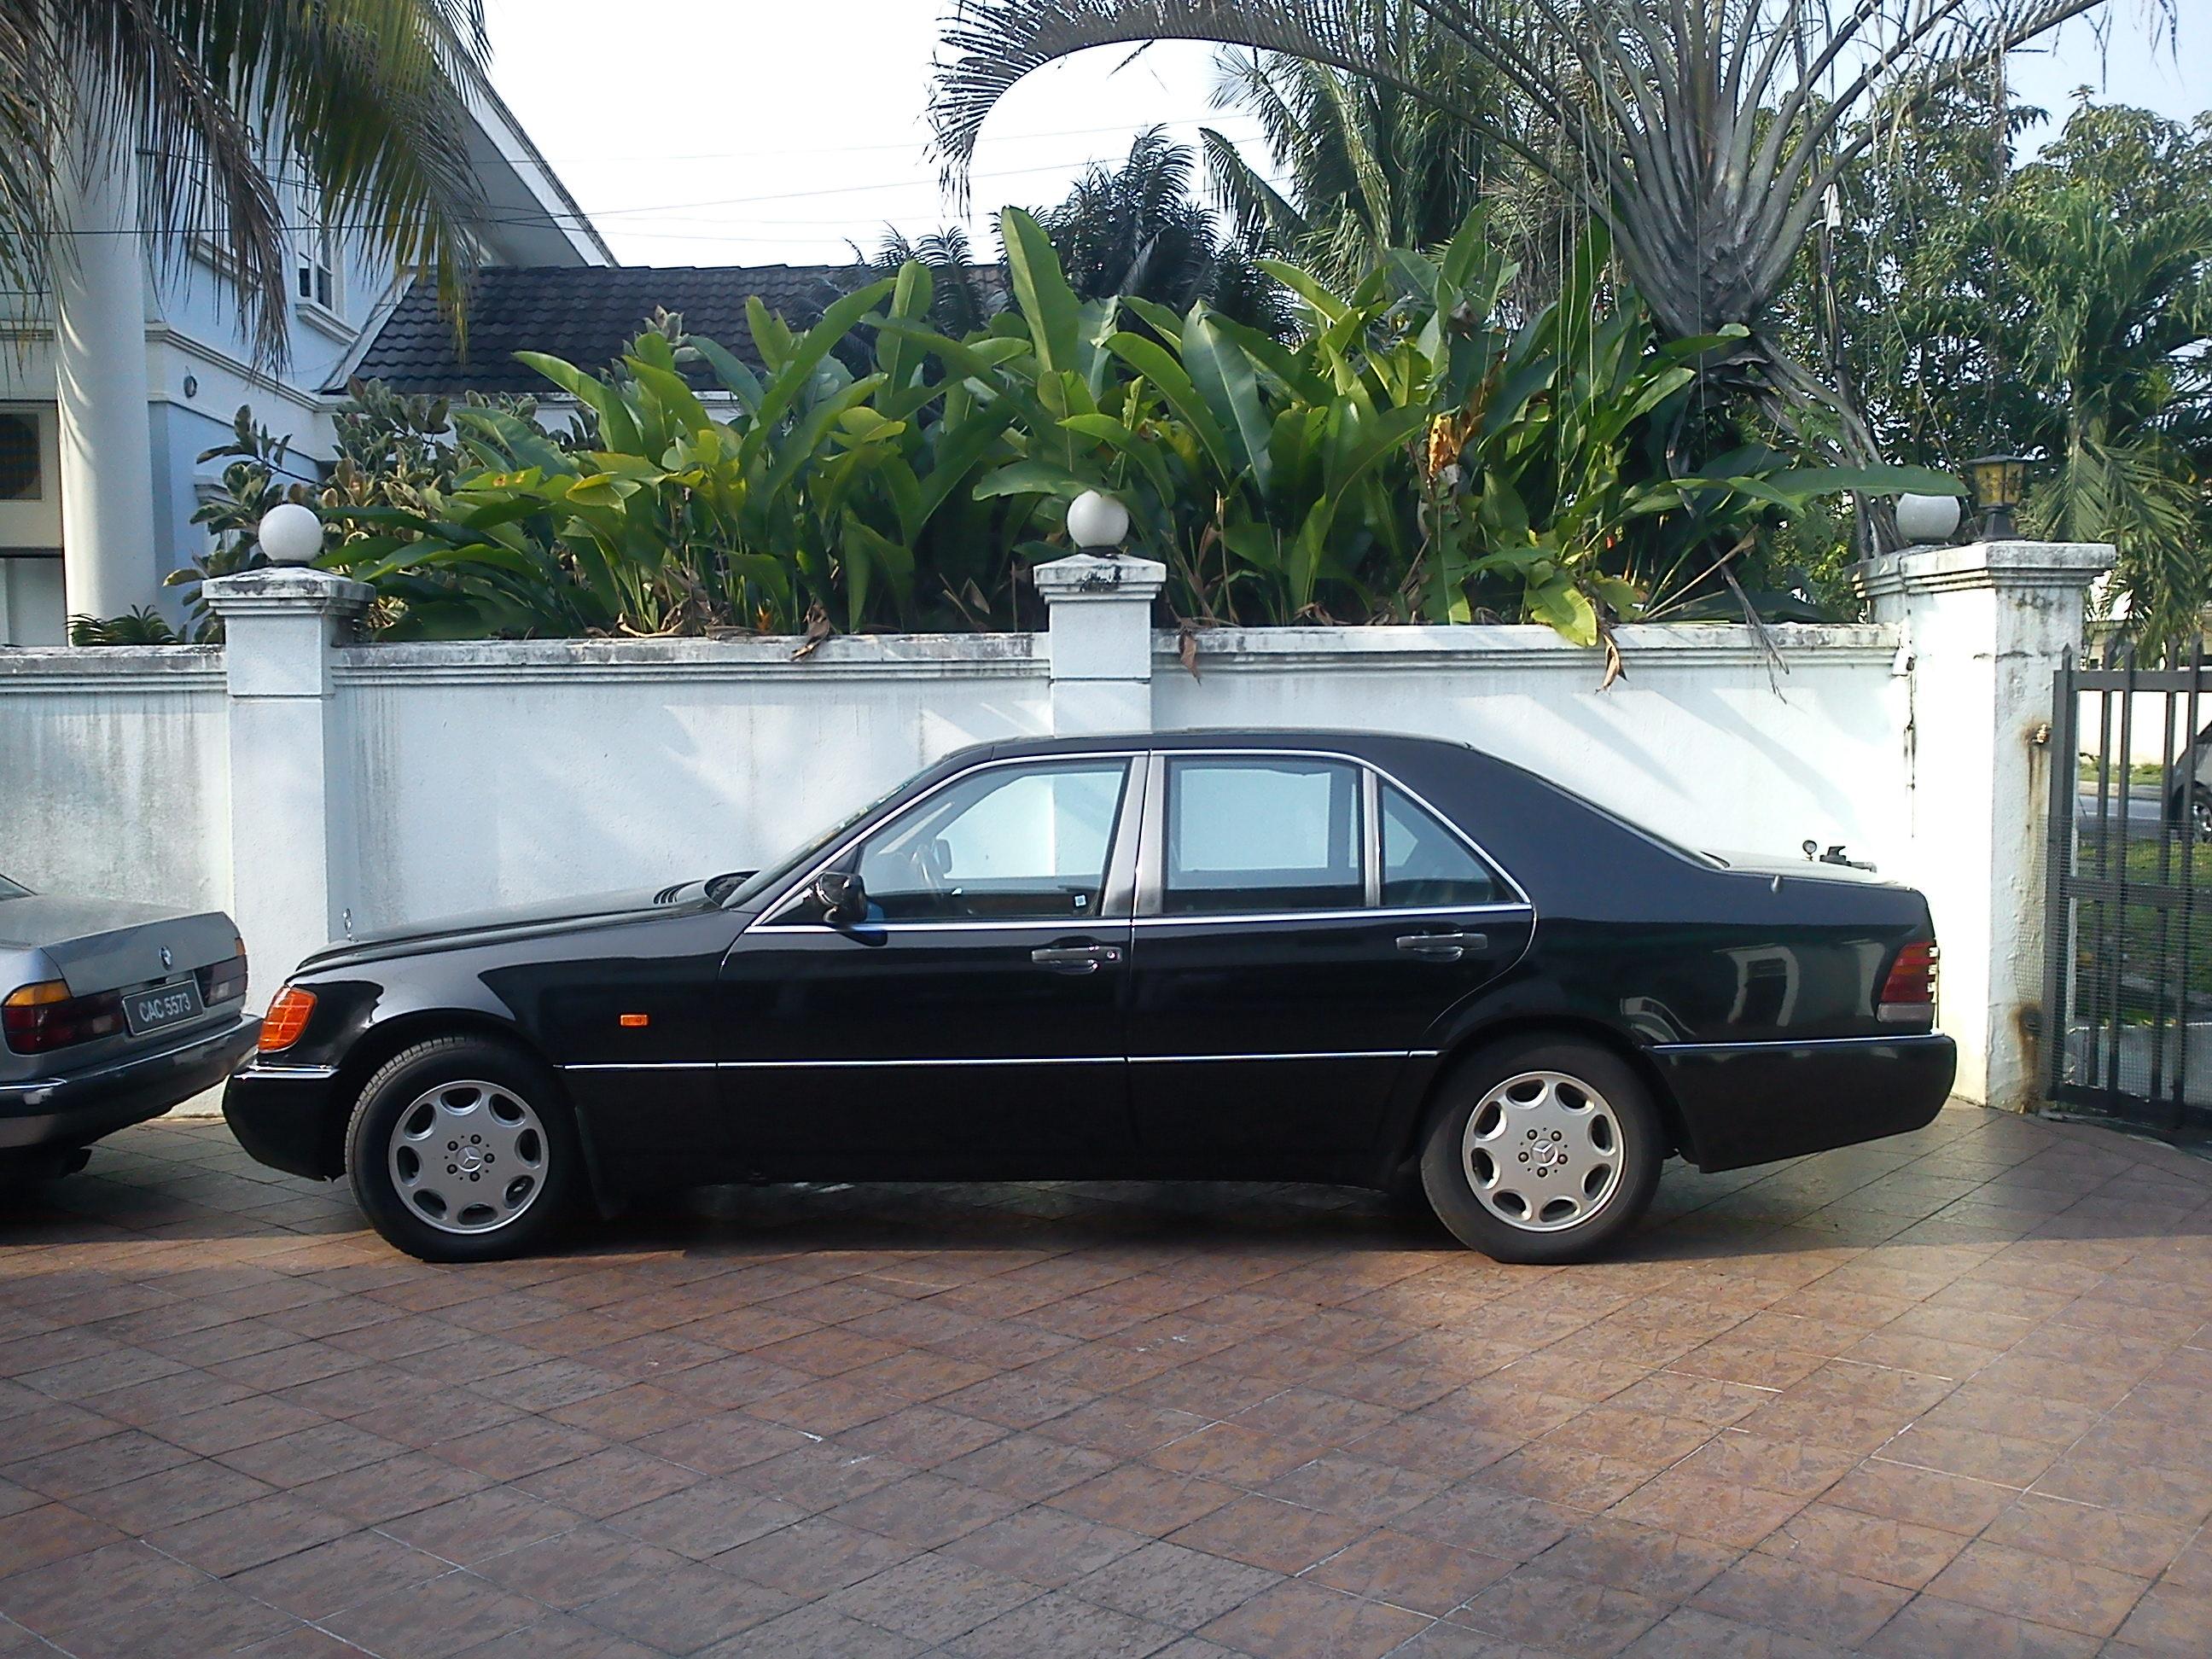 1992 mercedes benz w140 s class review the invincible sedan for Mercedes benz 1992